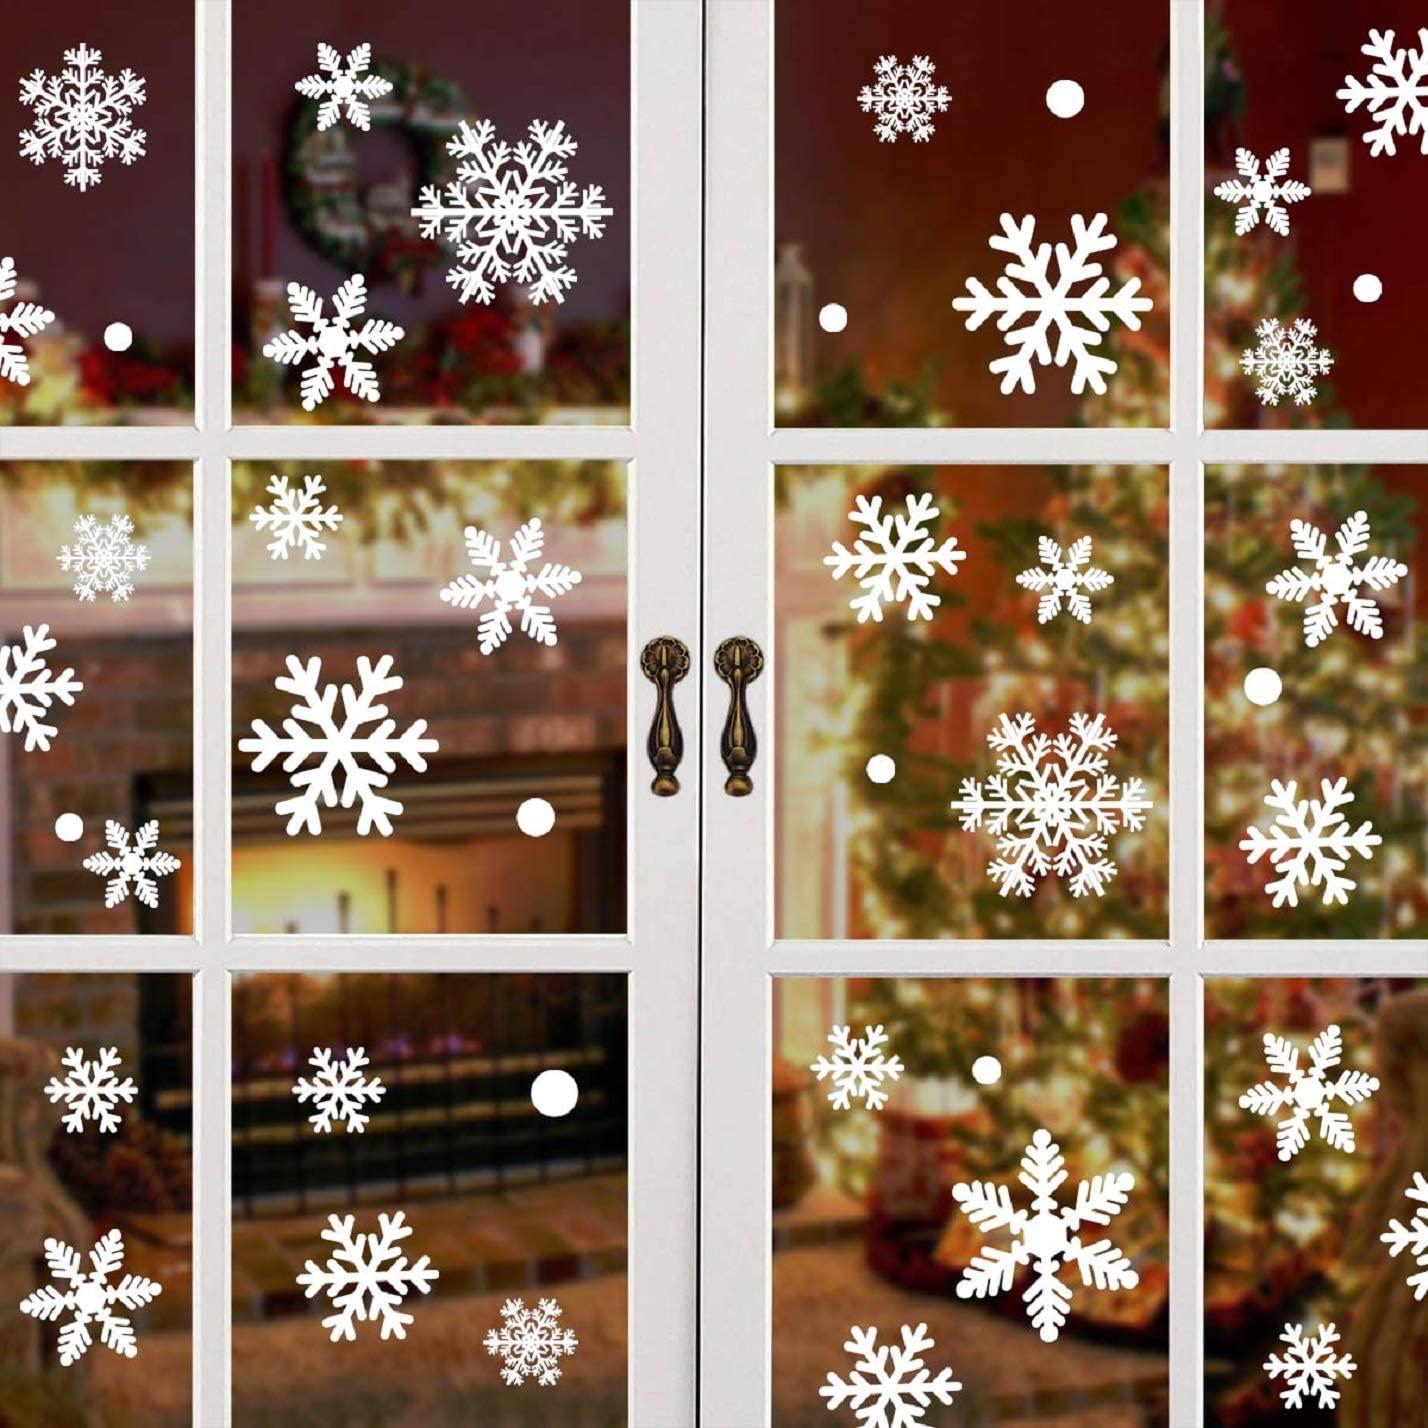 heekpek 15 Sheets 270 PCS Christmas Snowflake Window Clings Decal Christmas Descoration Xmas Window Sticker Winter Wonderland Frozen Party for Glass Door Mirror Wall Manual Decals